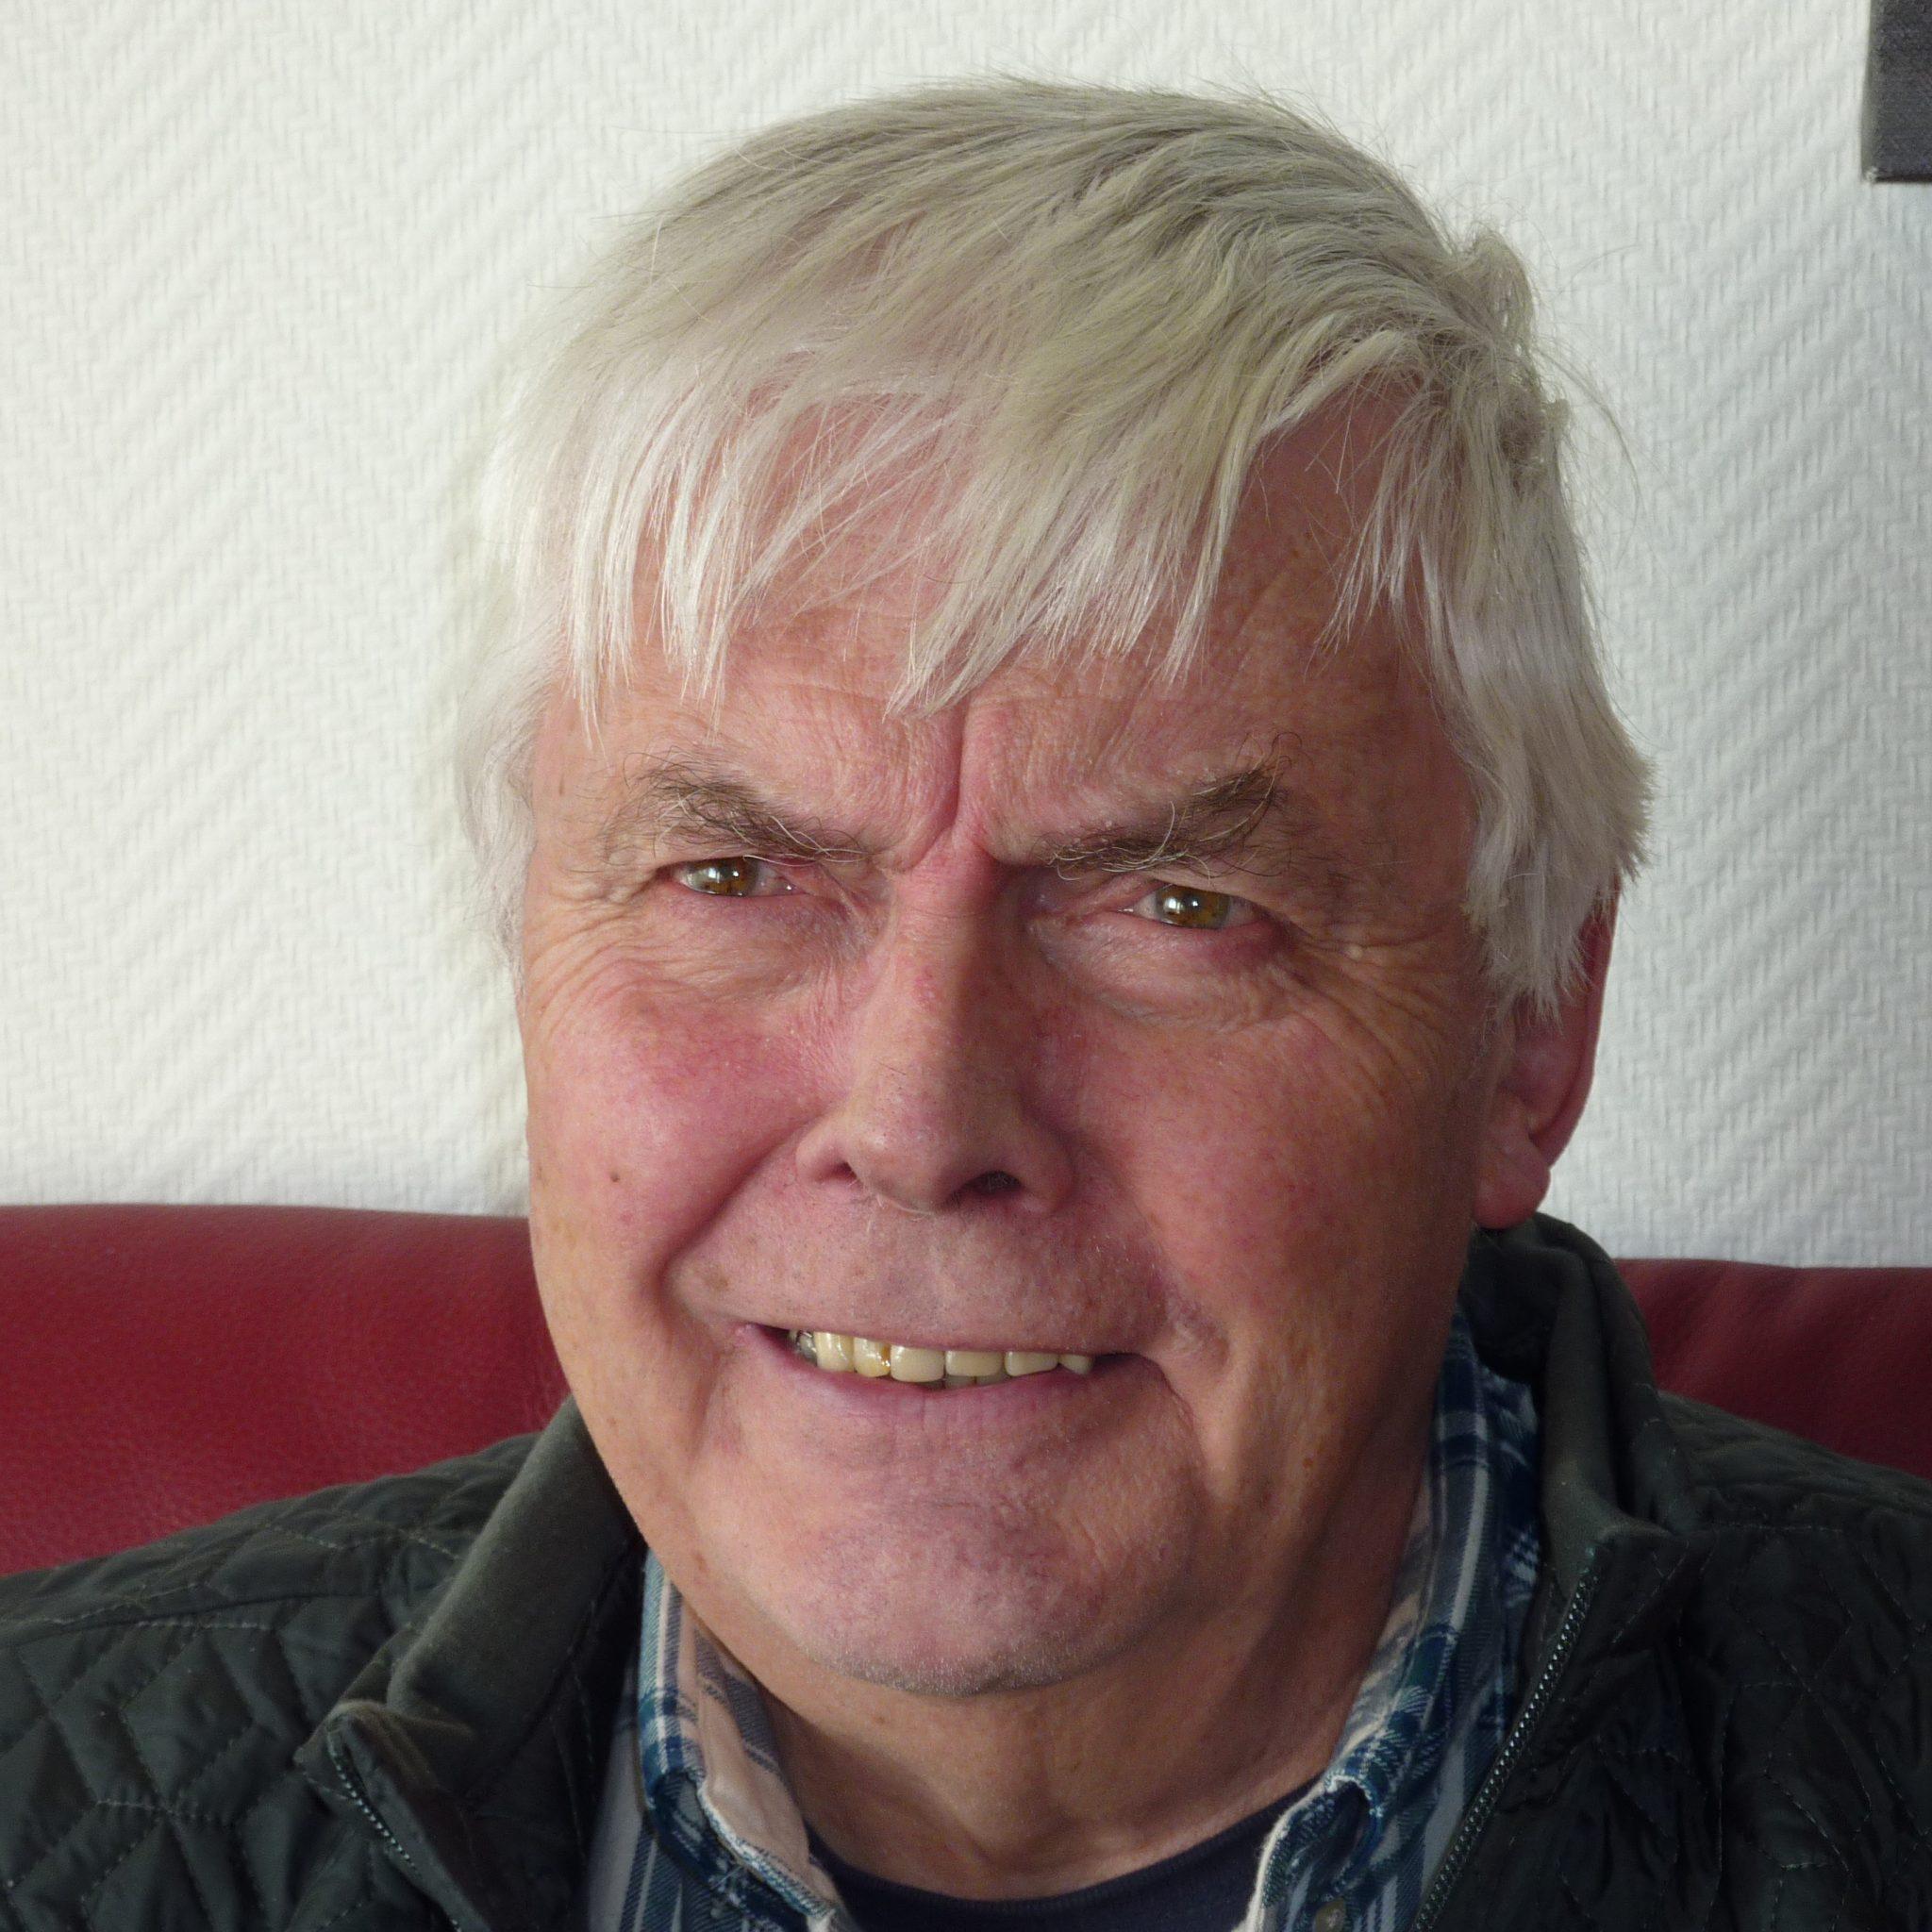 Klaas Kattouw